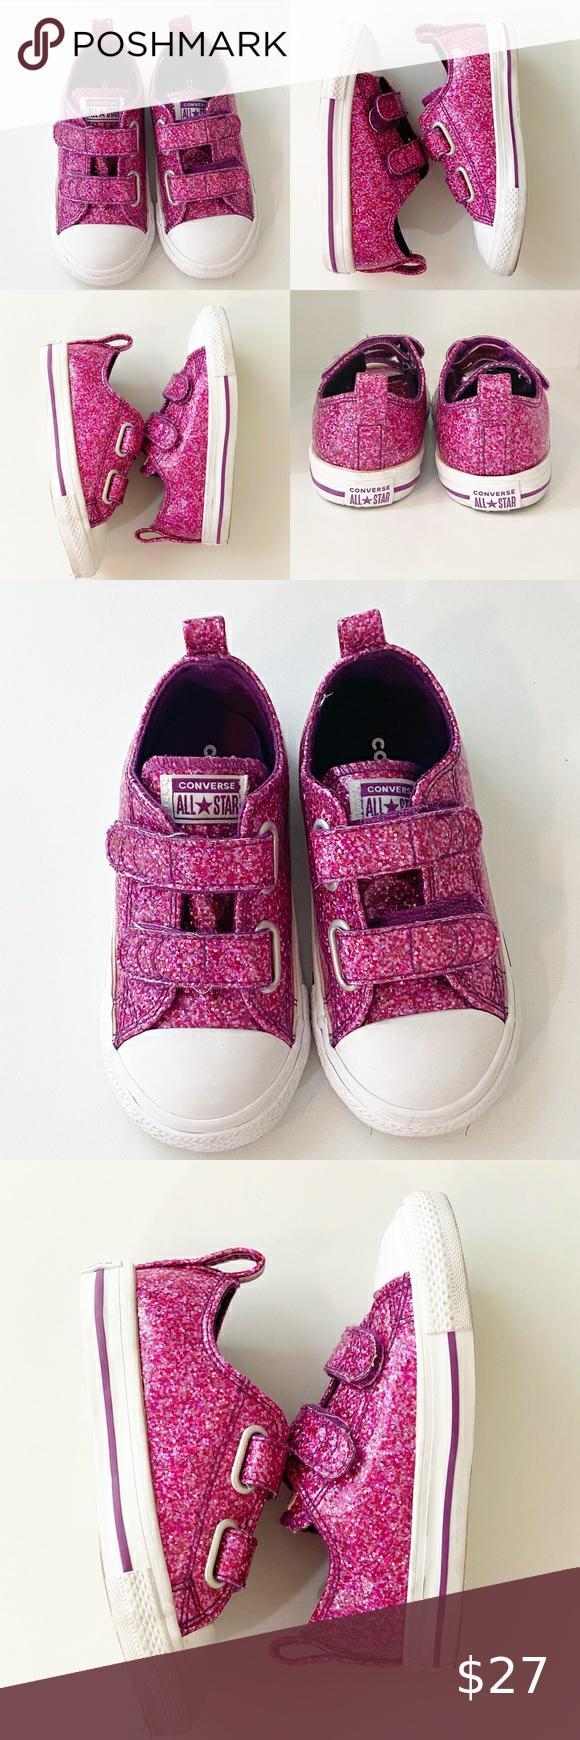 Converse All Star Pink Glitter